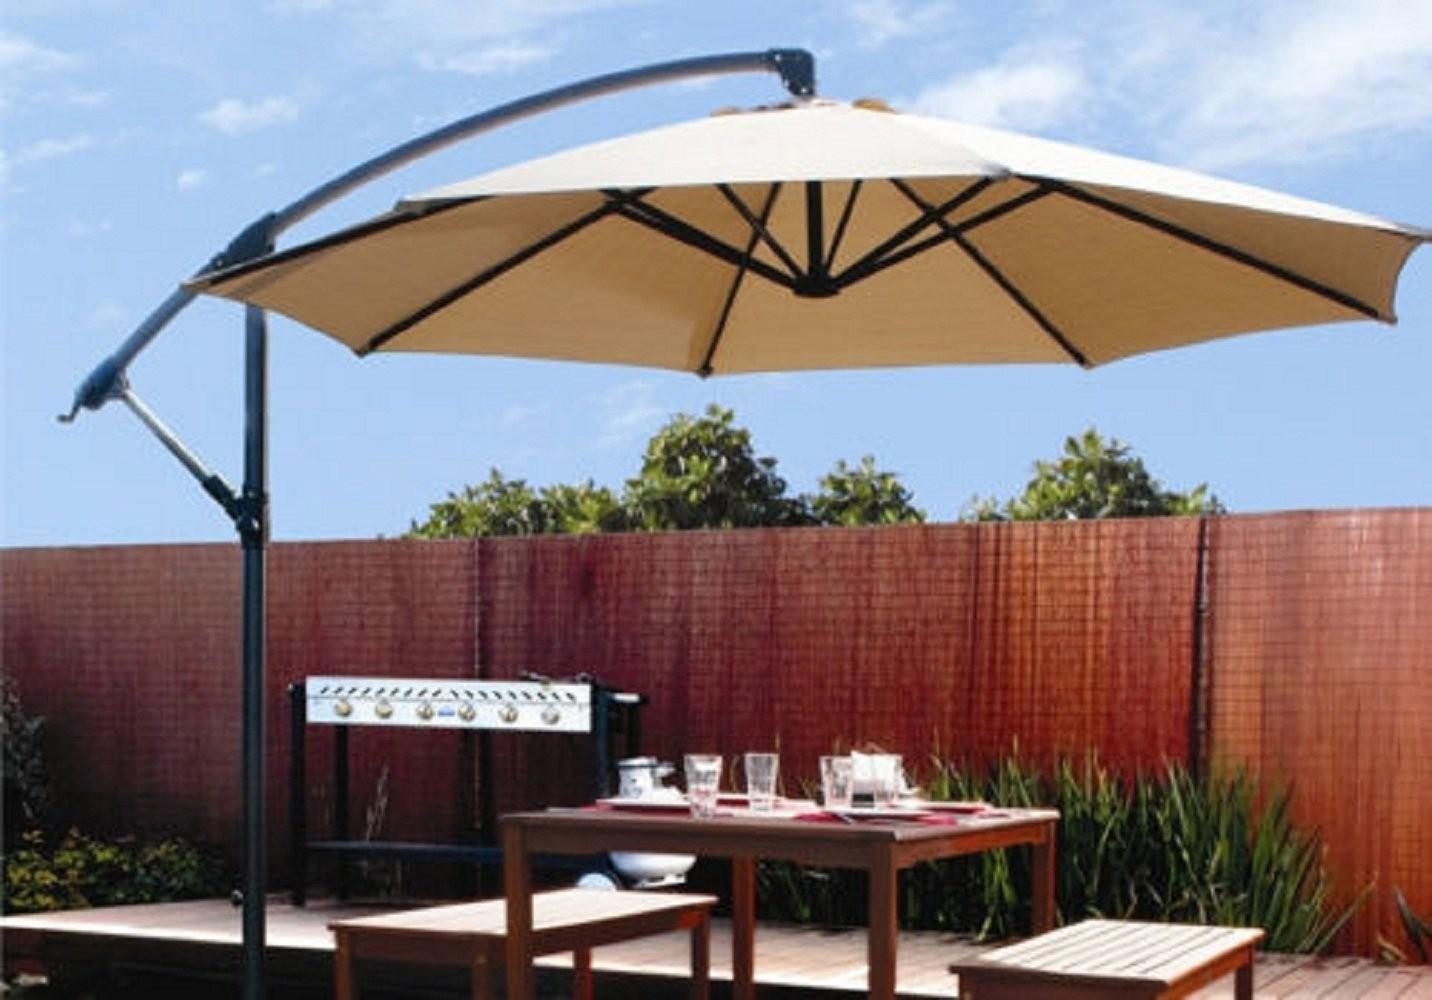 [10ft] Out Door Deck Patio Umbrella Off Set Tilt Cantilever Hanging Canopy  Tan